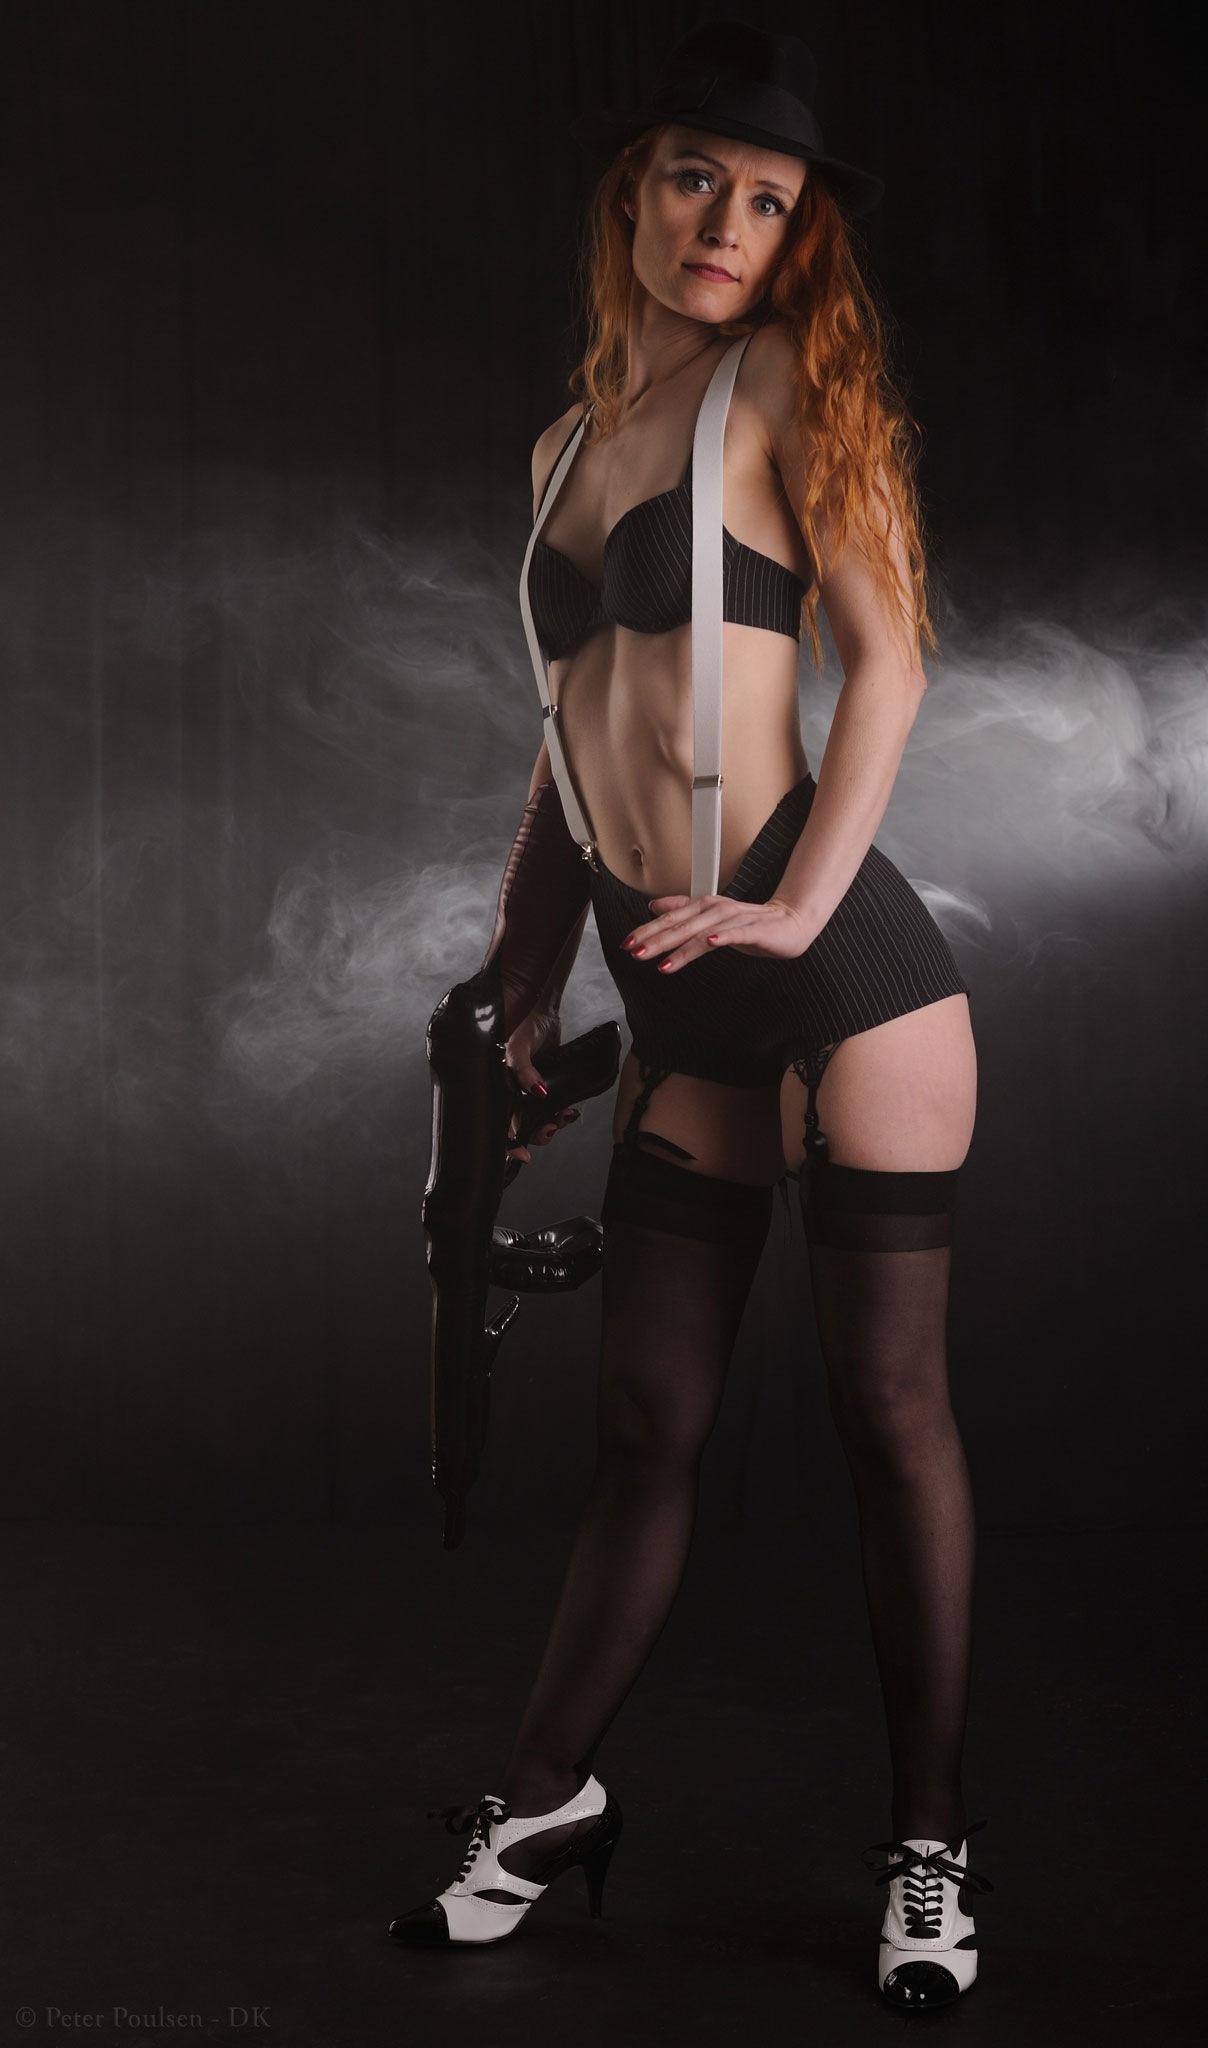 Ally Capone  by AB Tønnesen - Freelance model